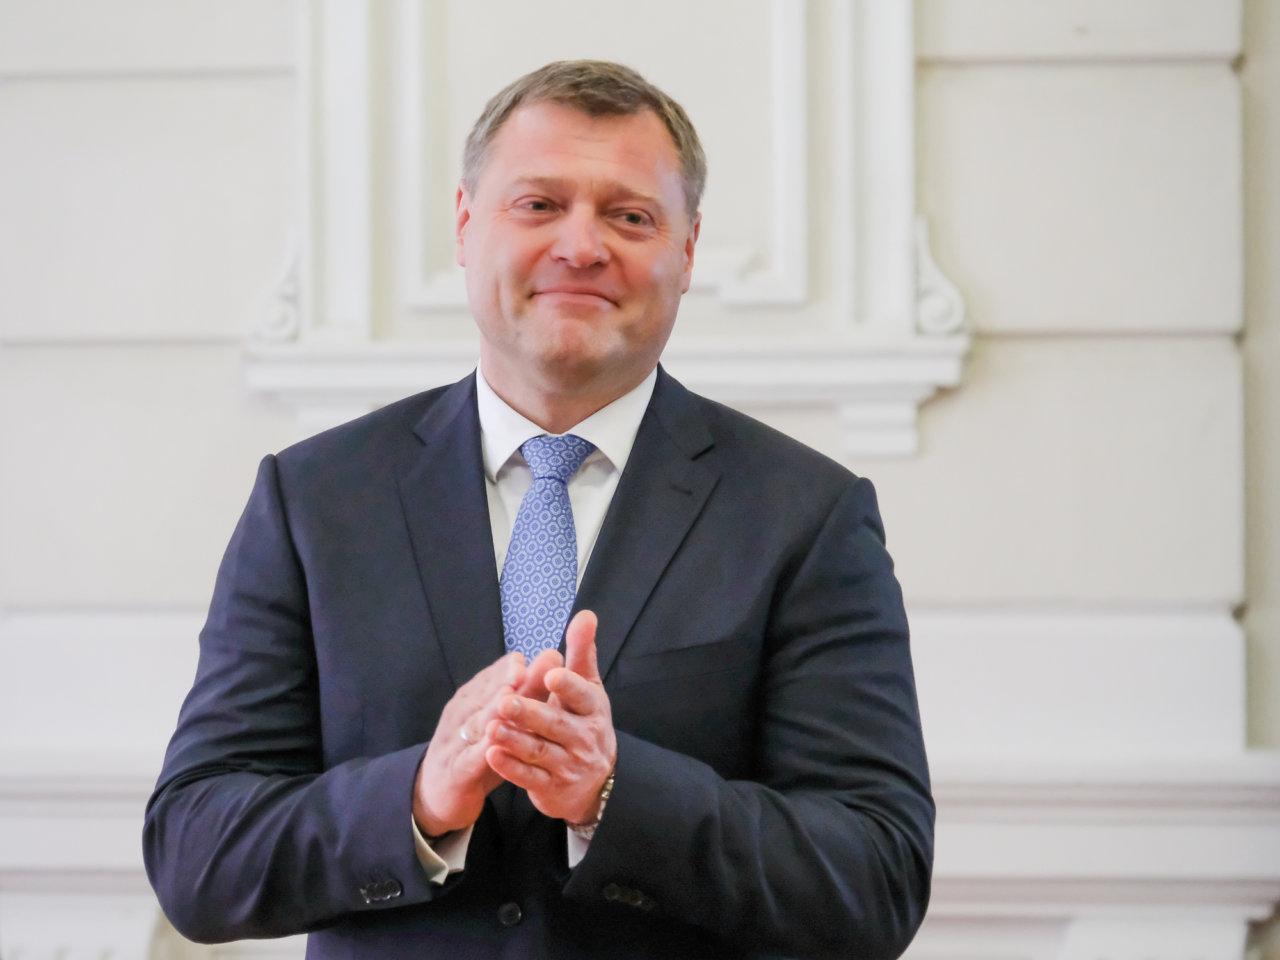 Игорь Бабушкин: мы собрали 2,2 млн тонн урожая